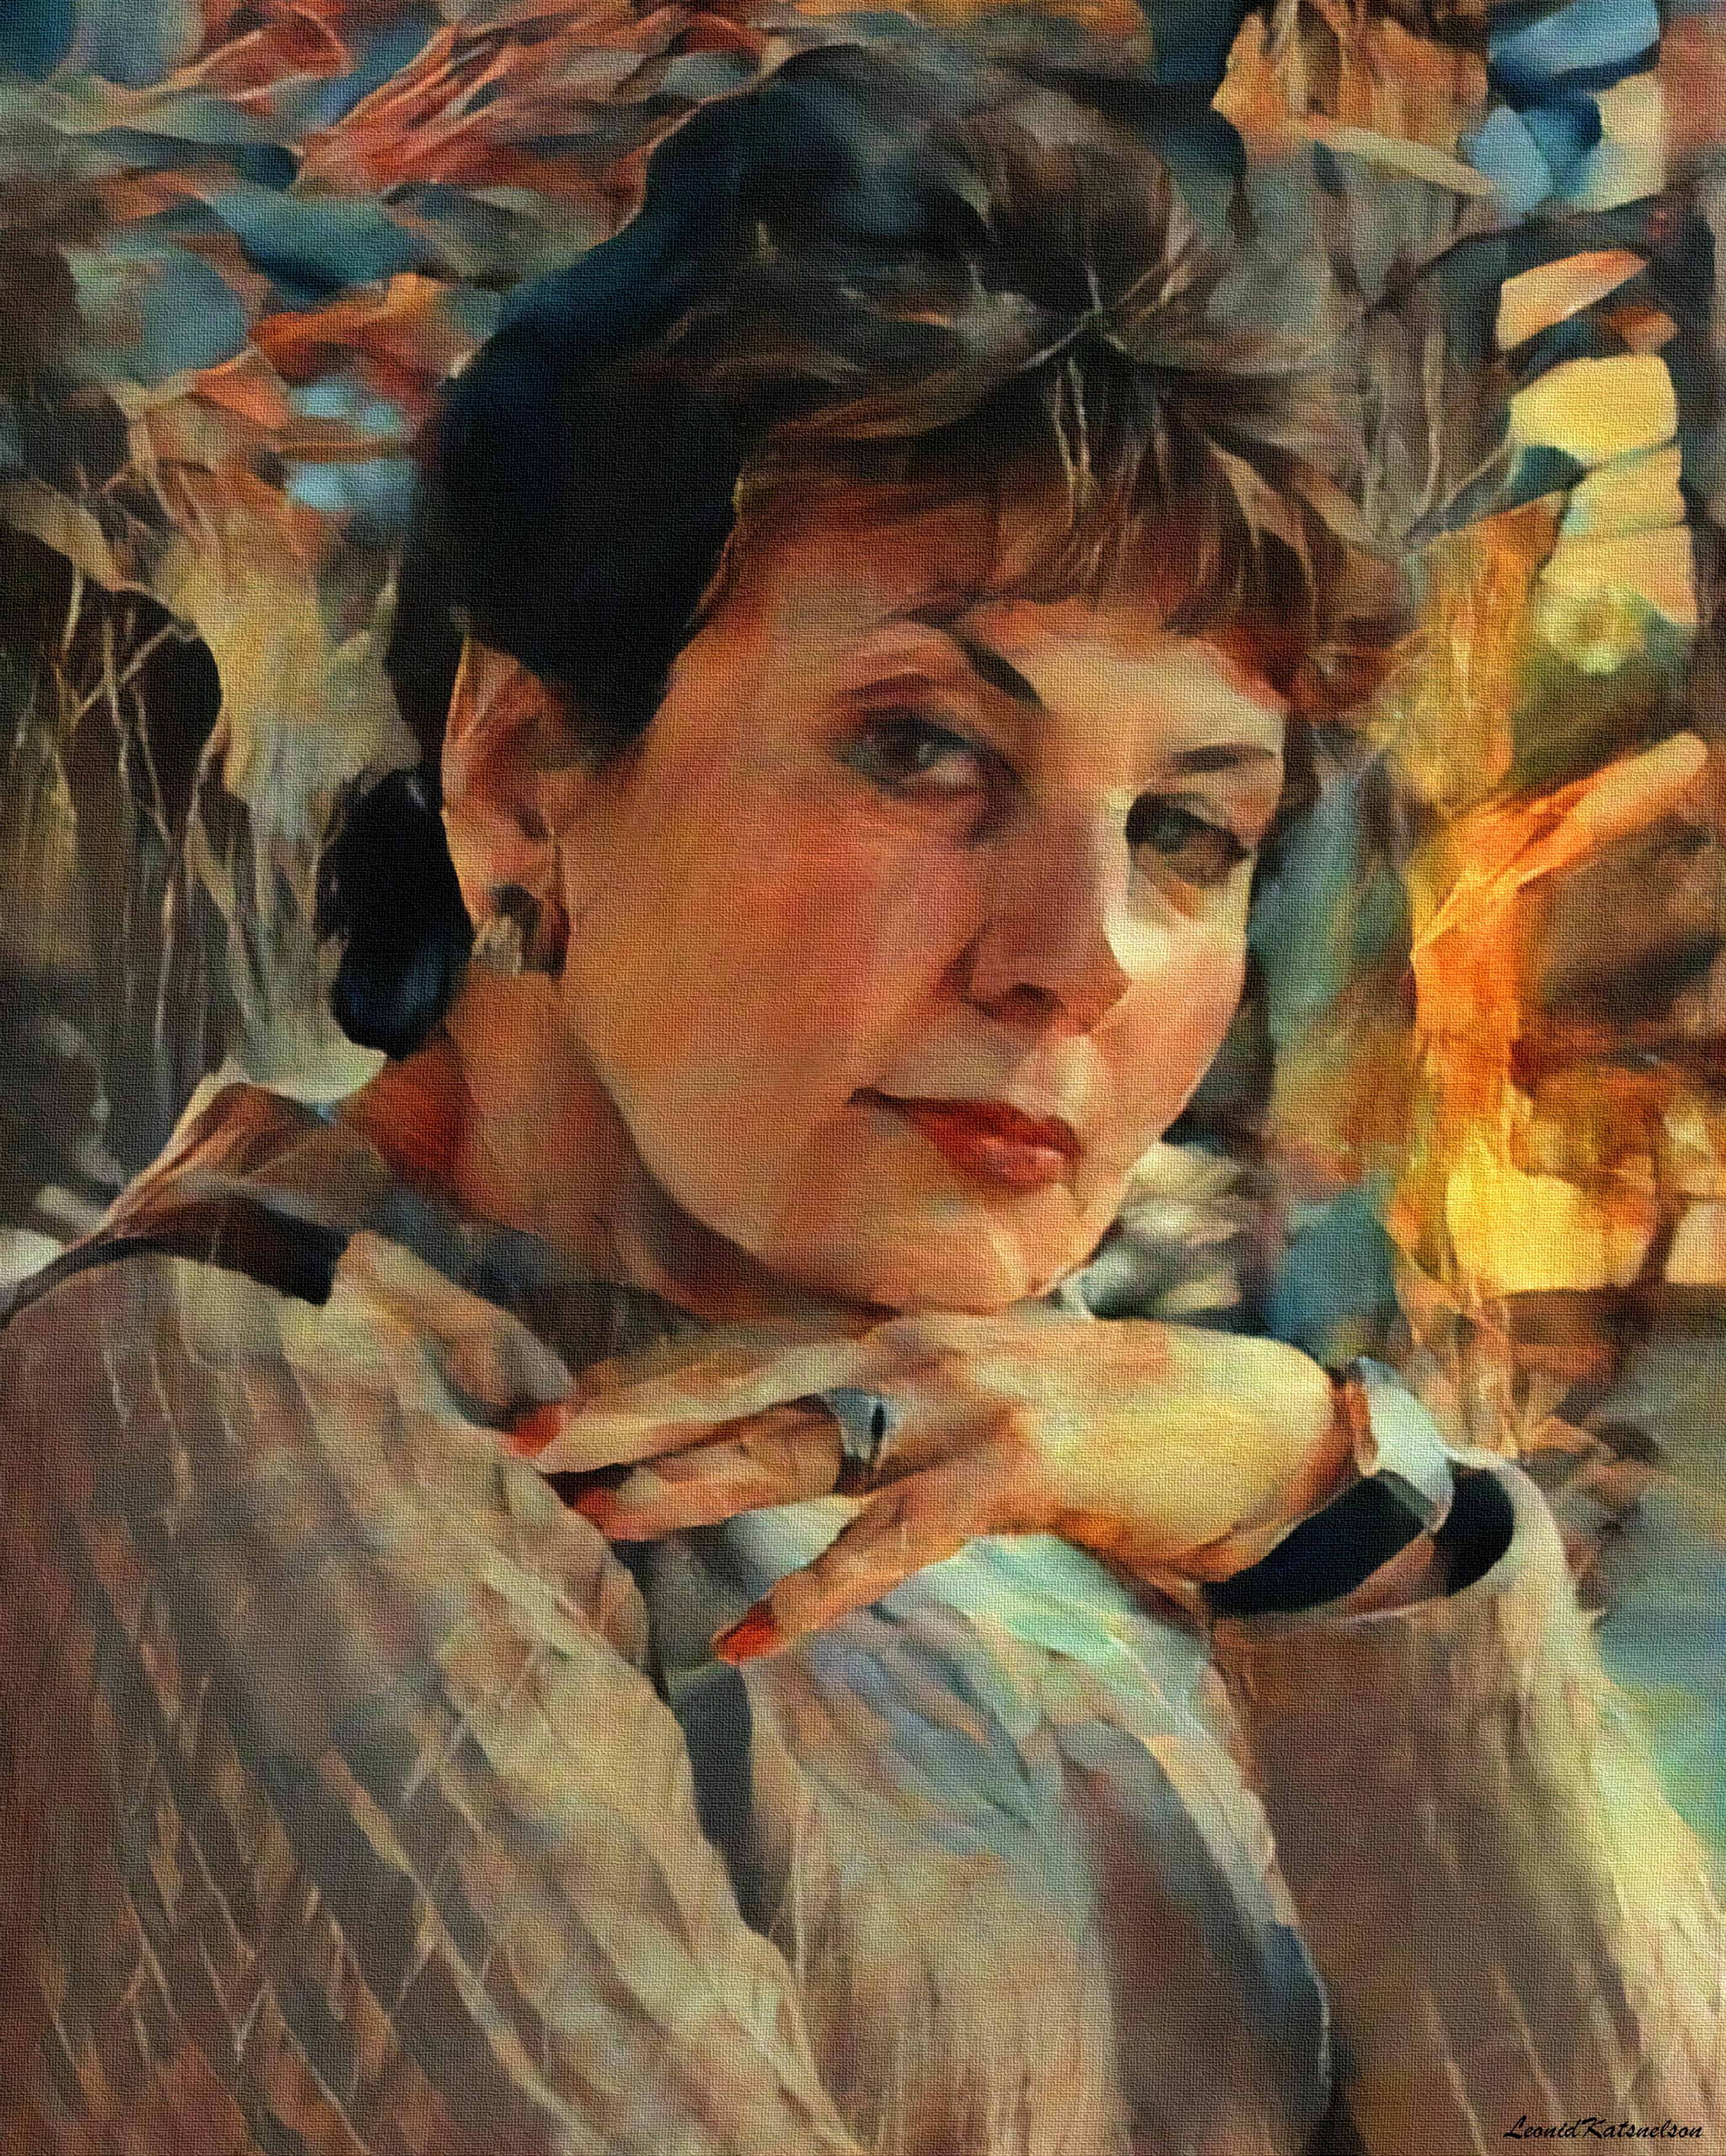 Lena Levina